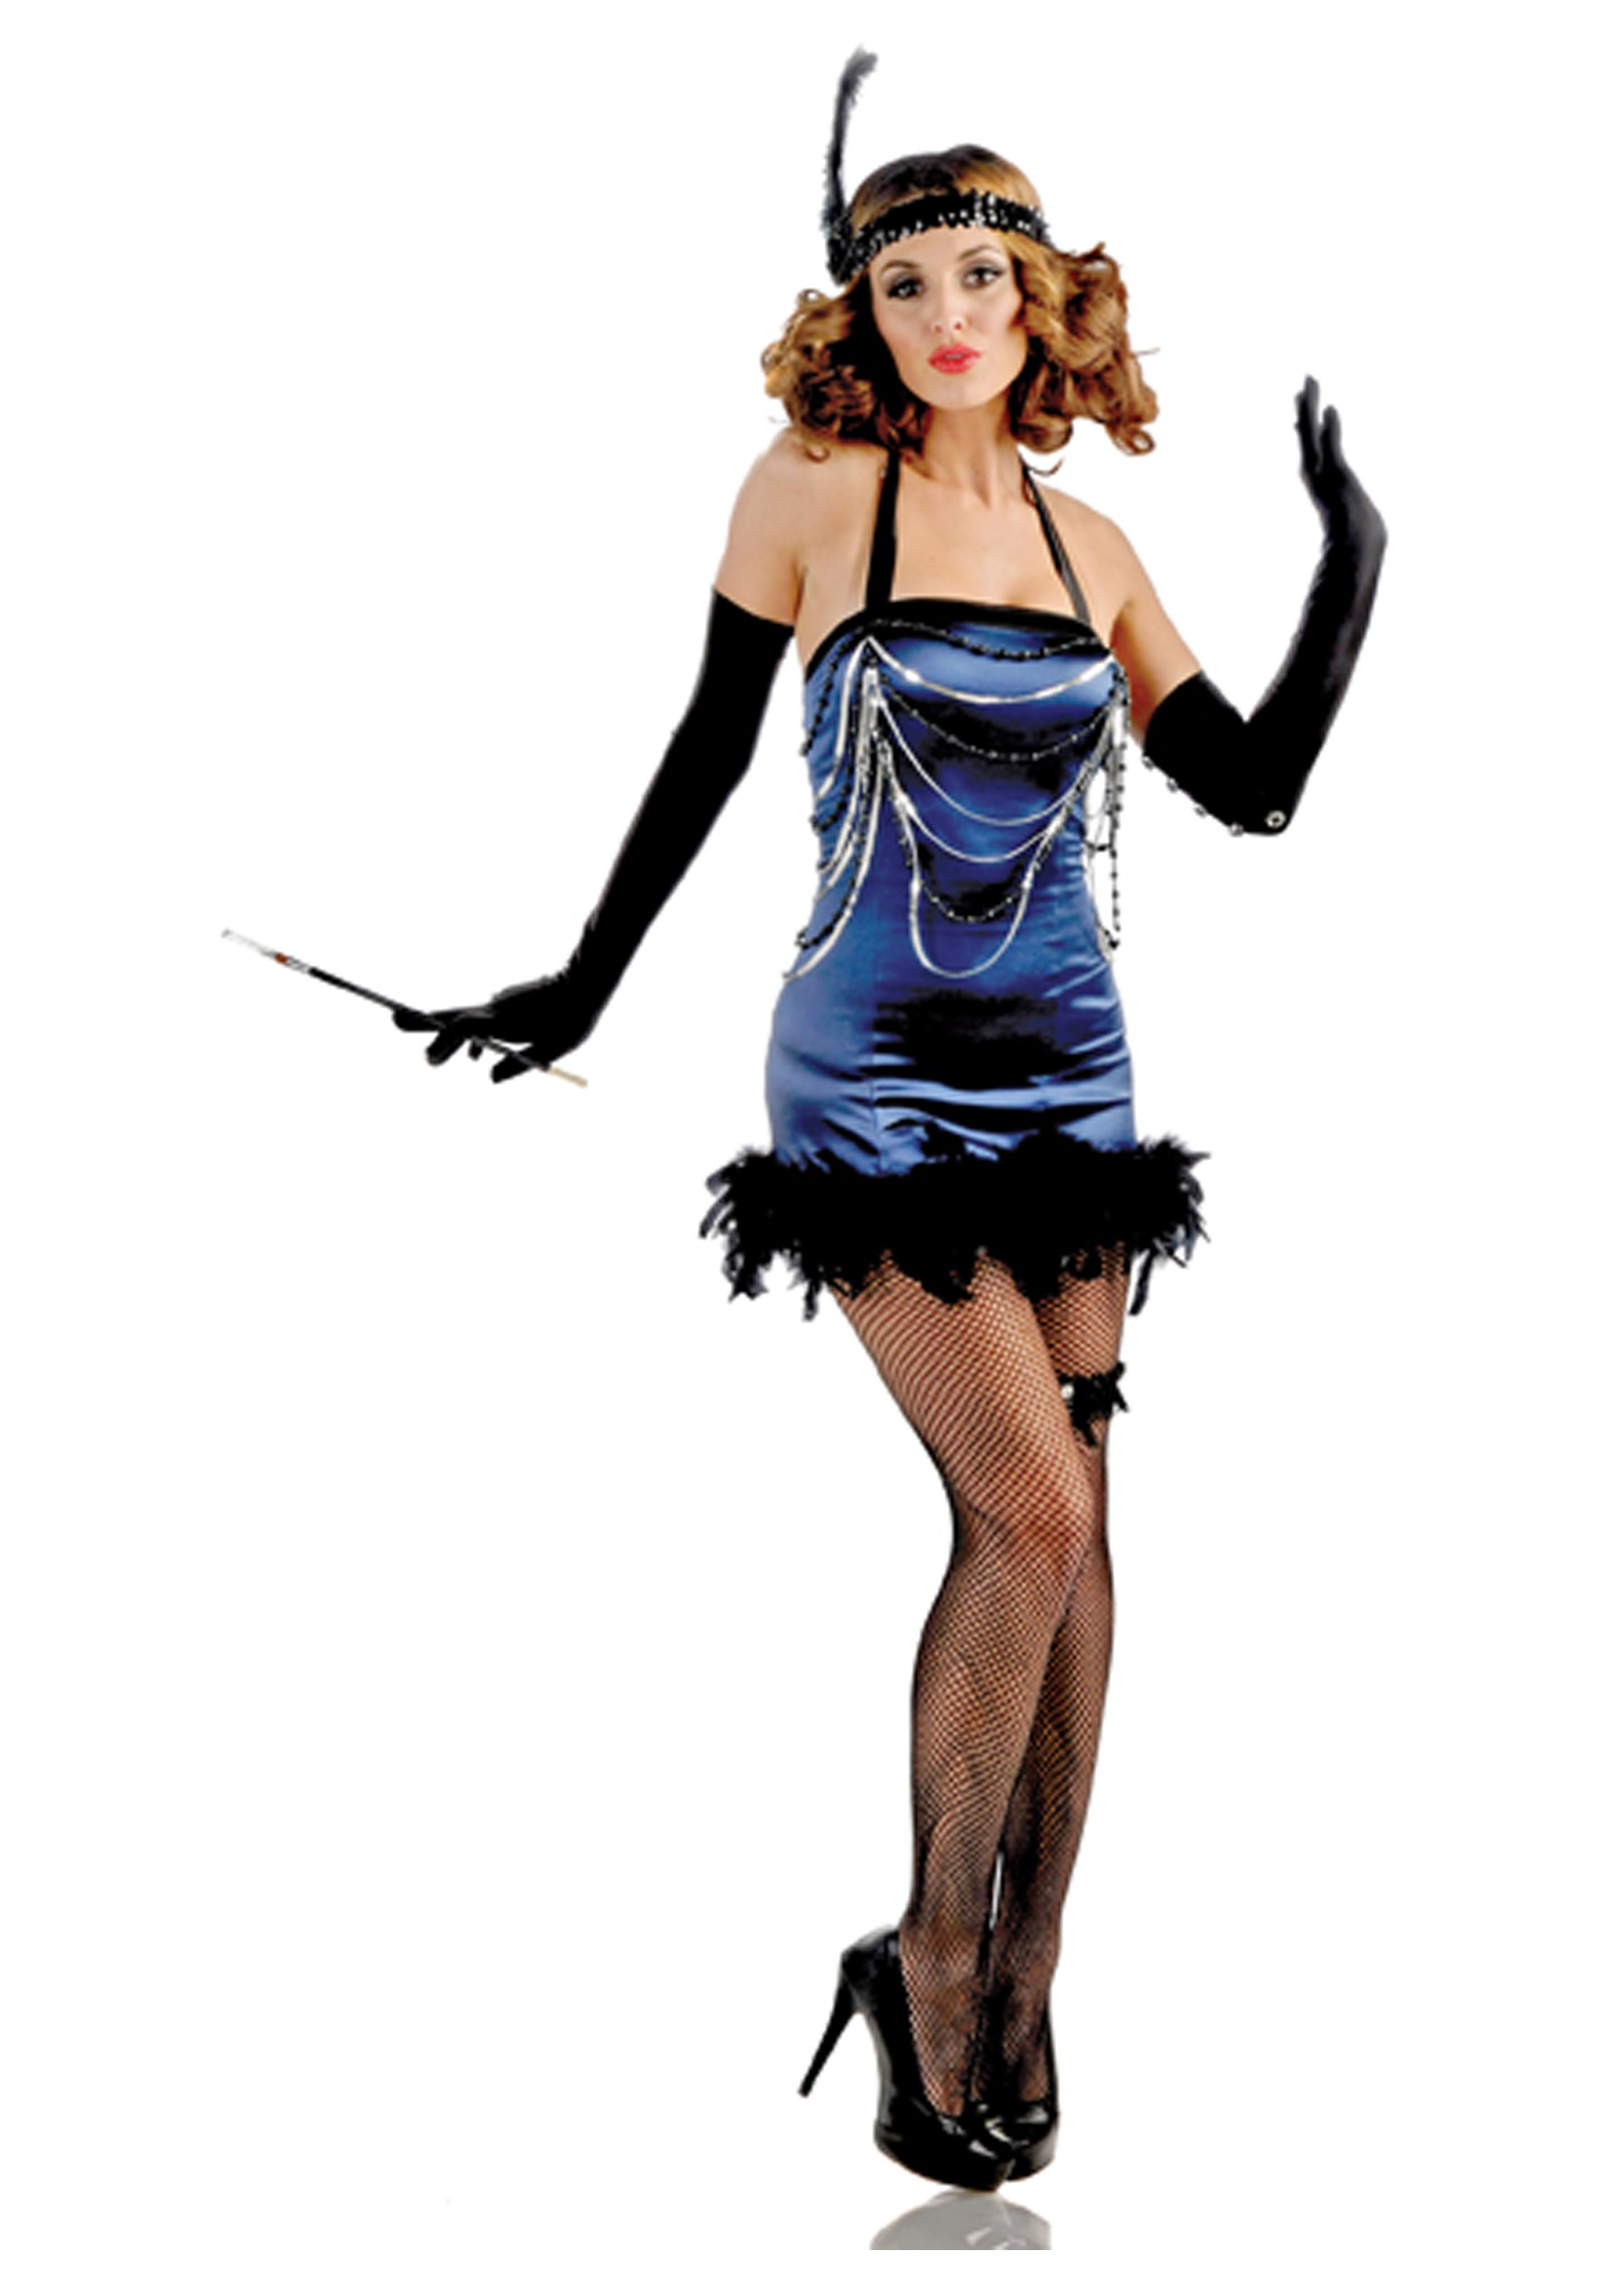 Cheap Kids Flapper Dress Costume, Find Kids Flapper Dress Costume Deals On Line